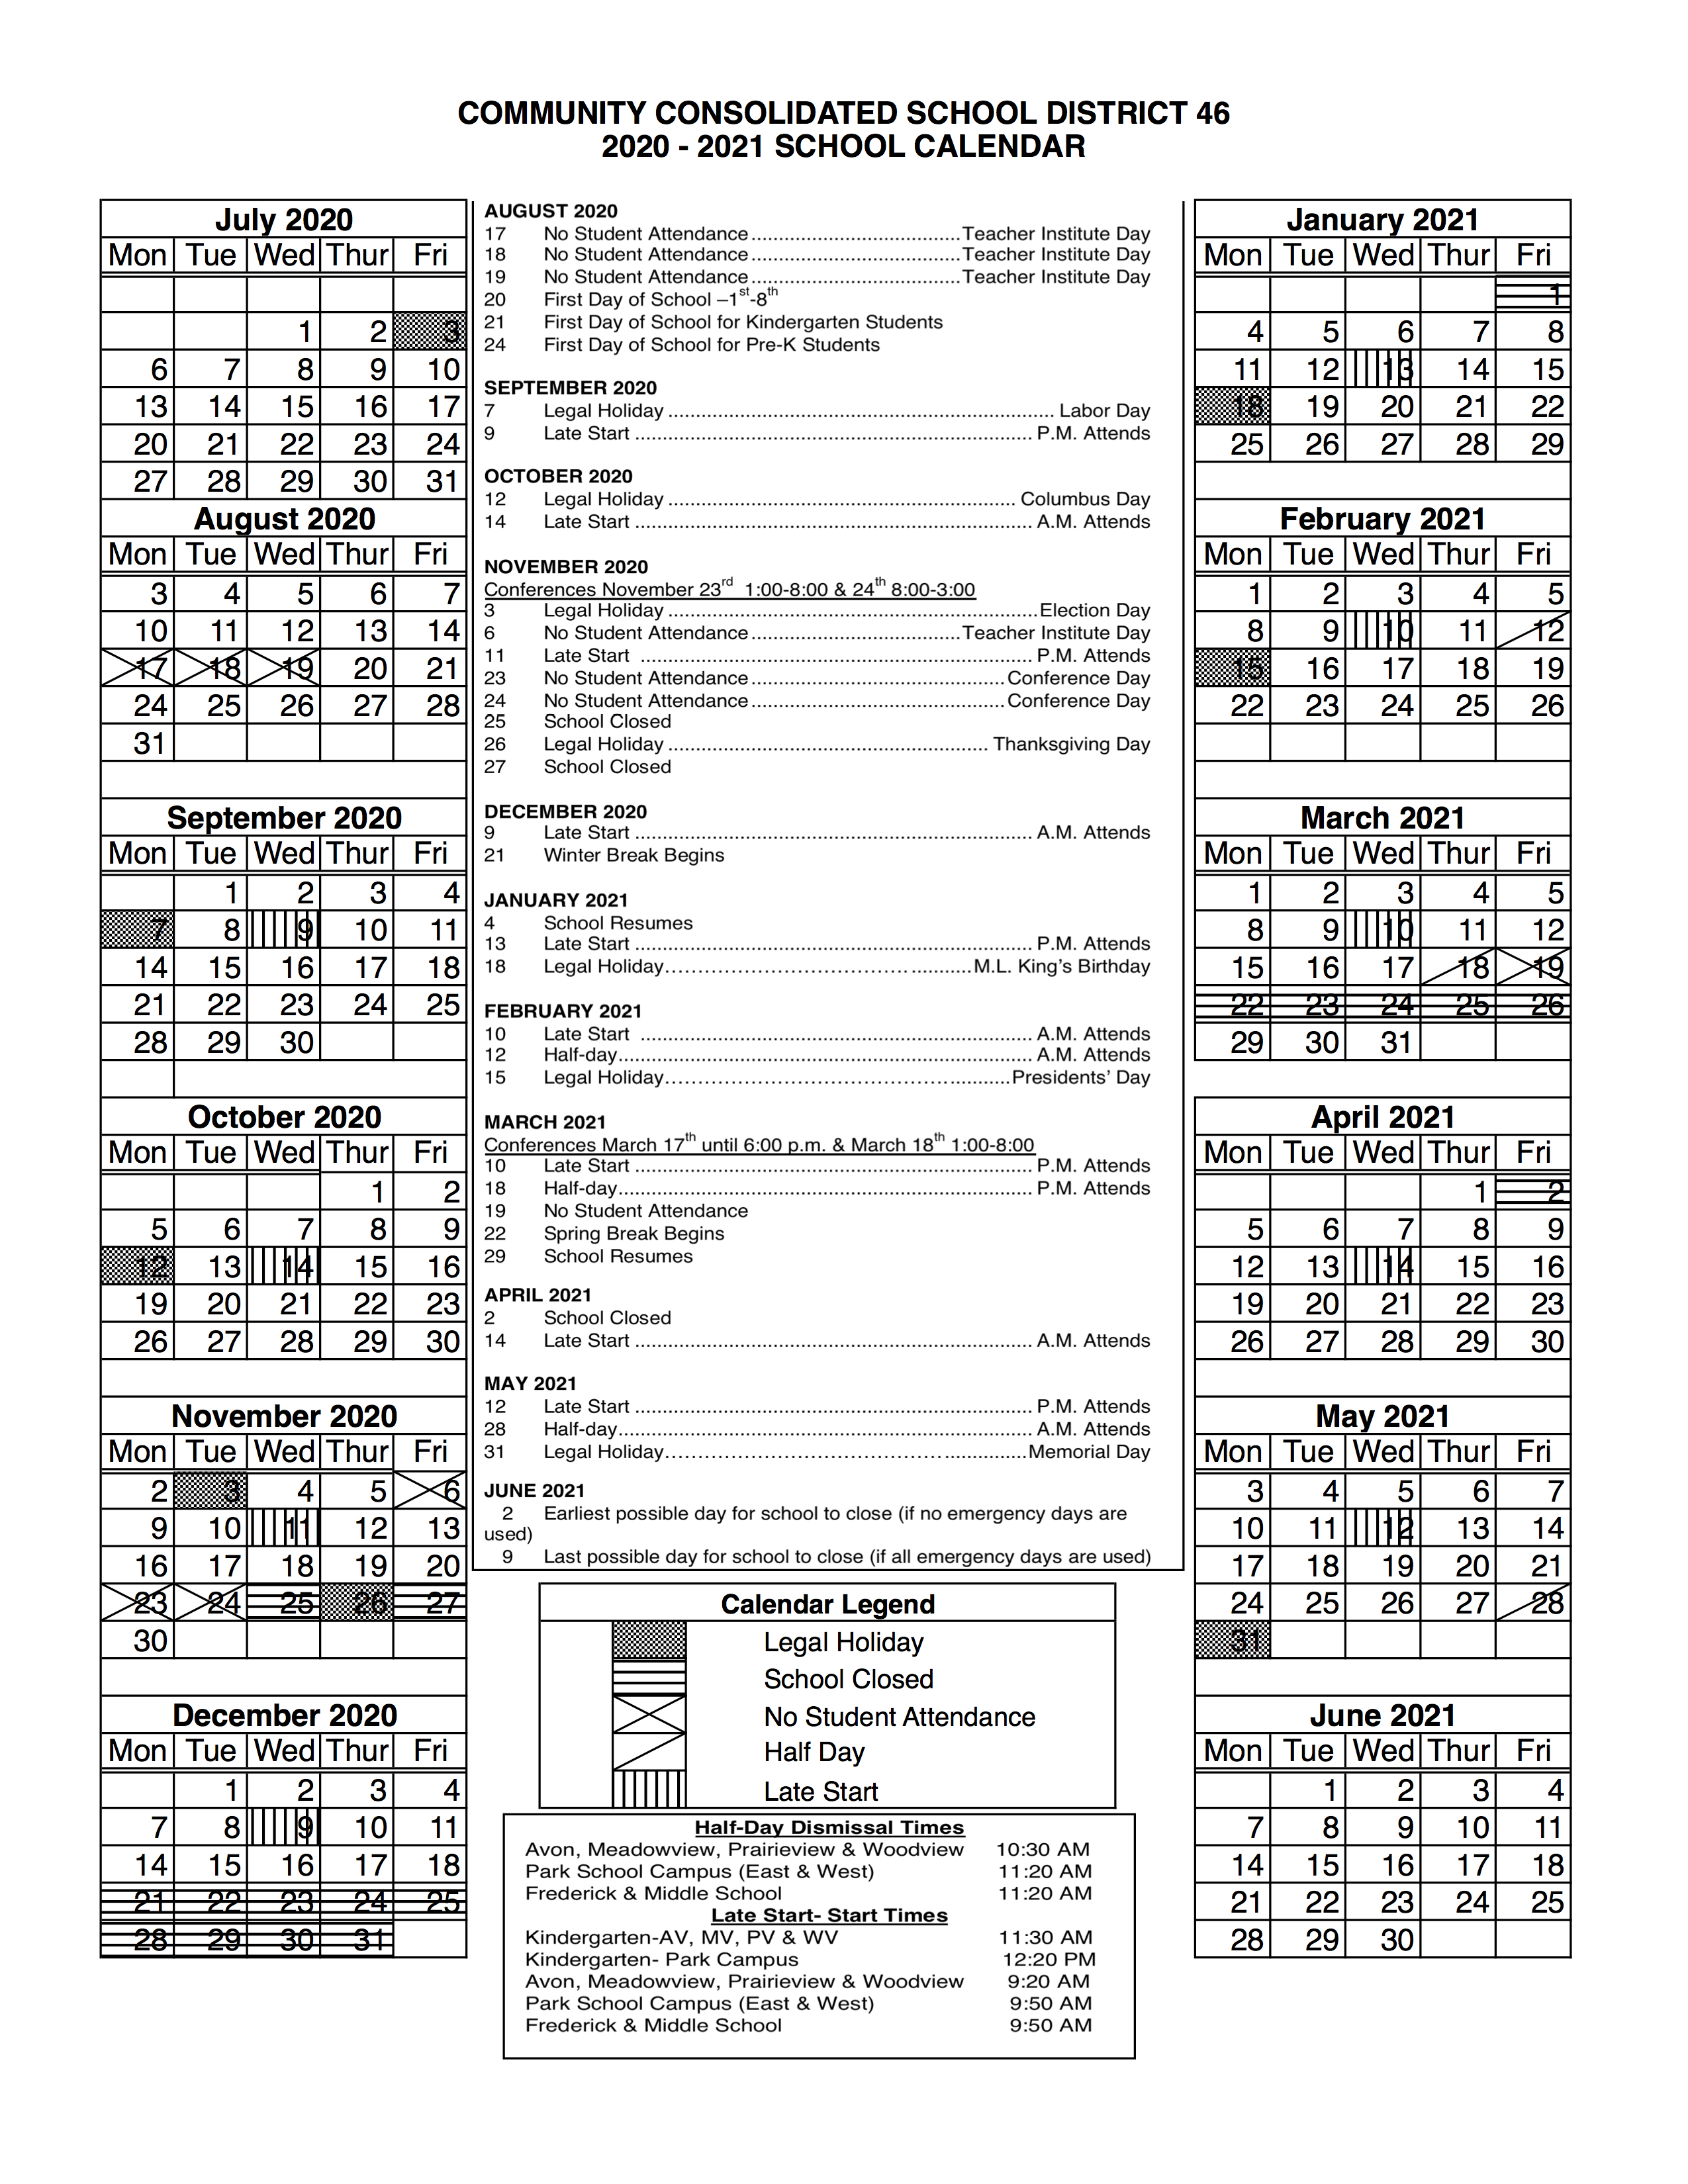 Ccsd Calendar 2022.Ccsd 46 District Calendar